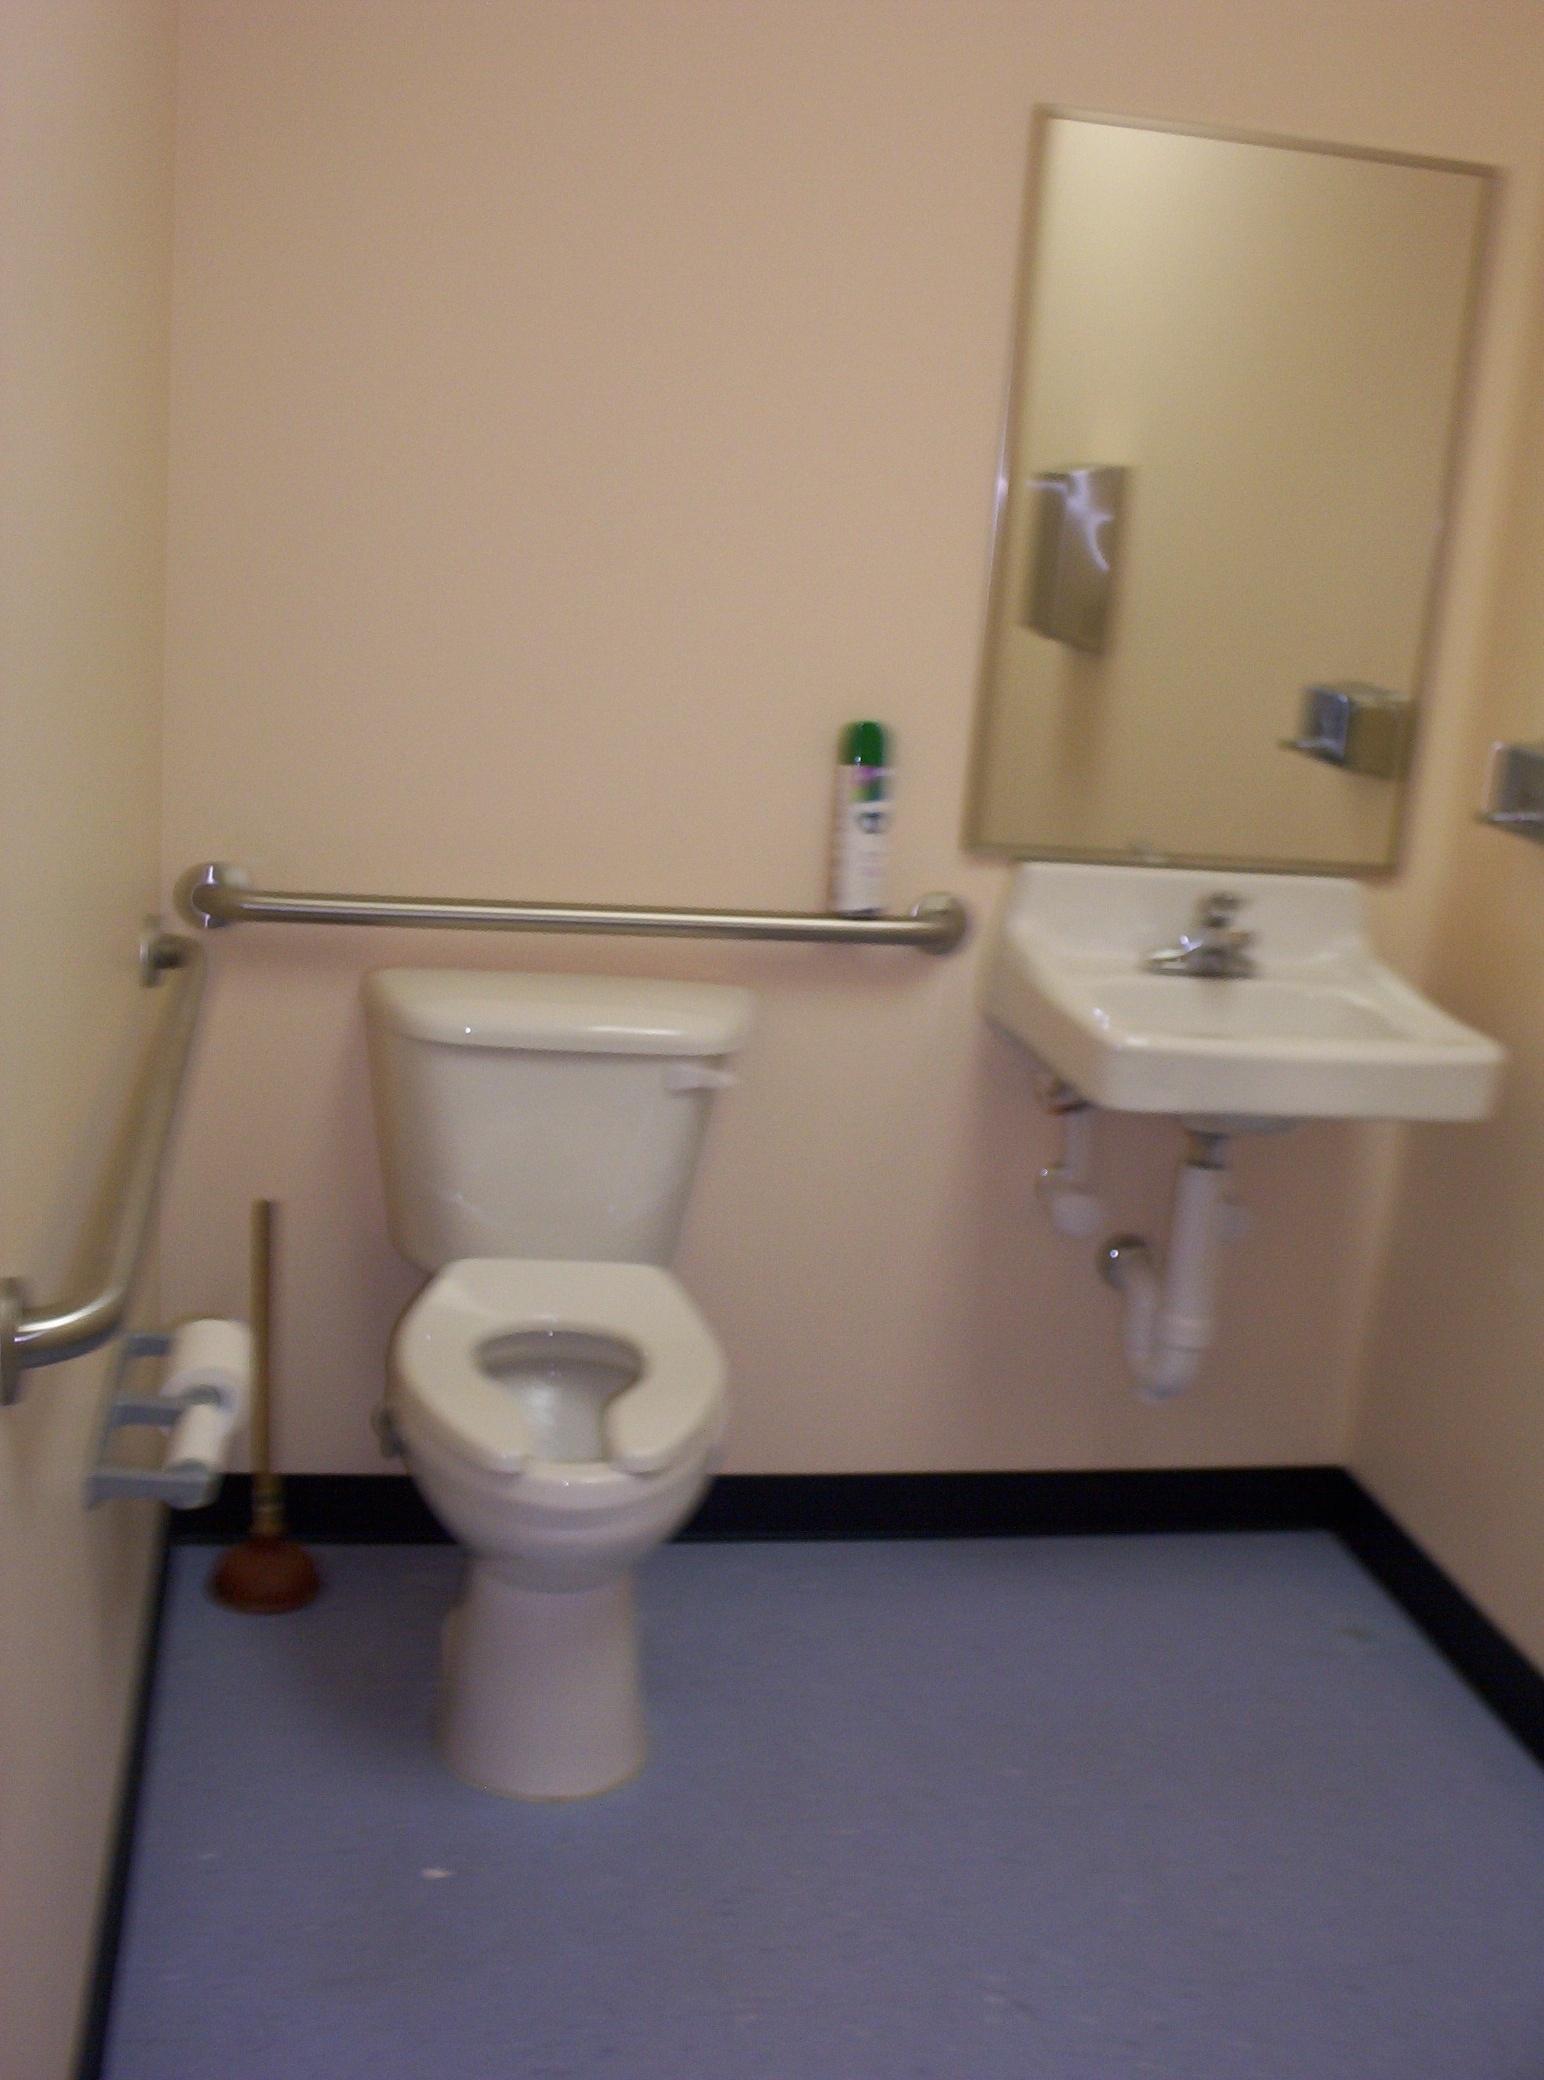 Public Restroom Stalls Sacramento Ca Restroom Sign